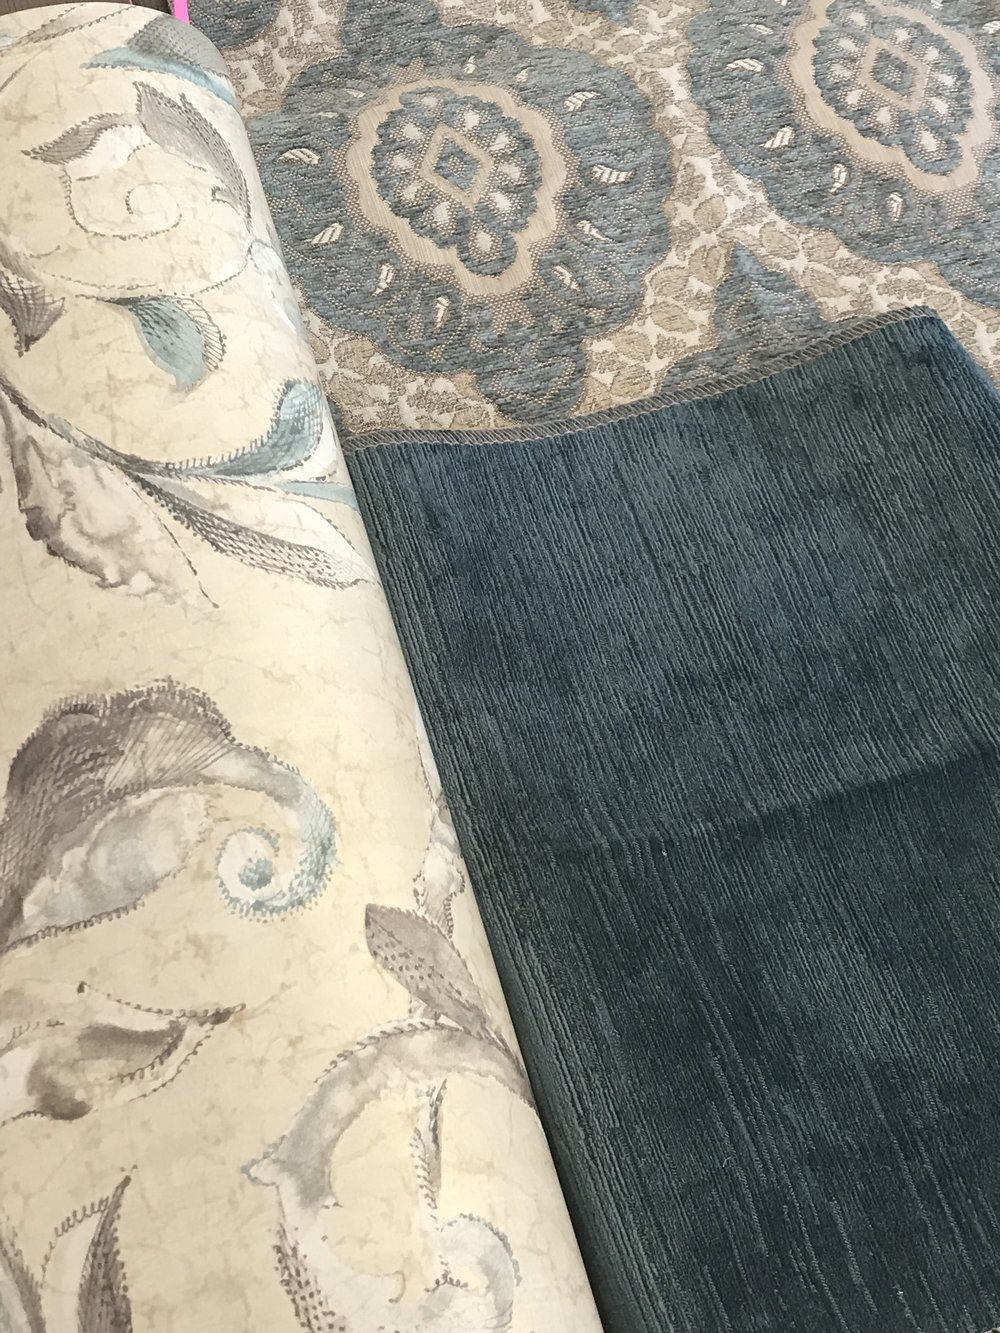 Medallion Study Sofa Fabric, Blue Velvet Study Chair fabric, Study Bathroom Wallpaper